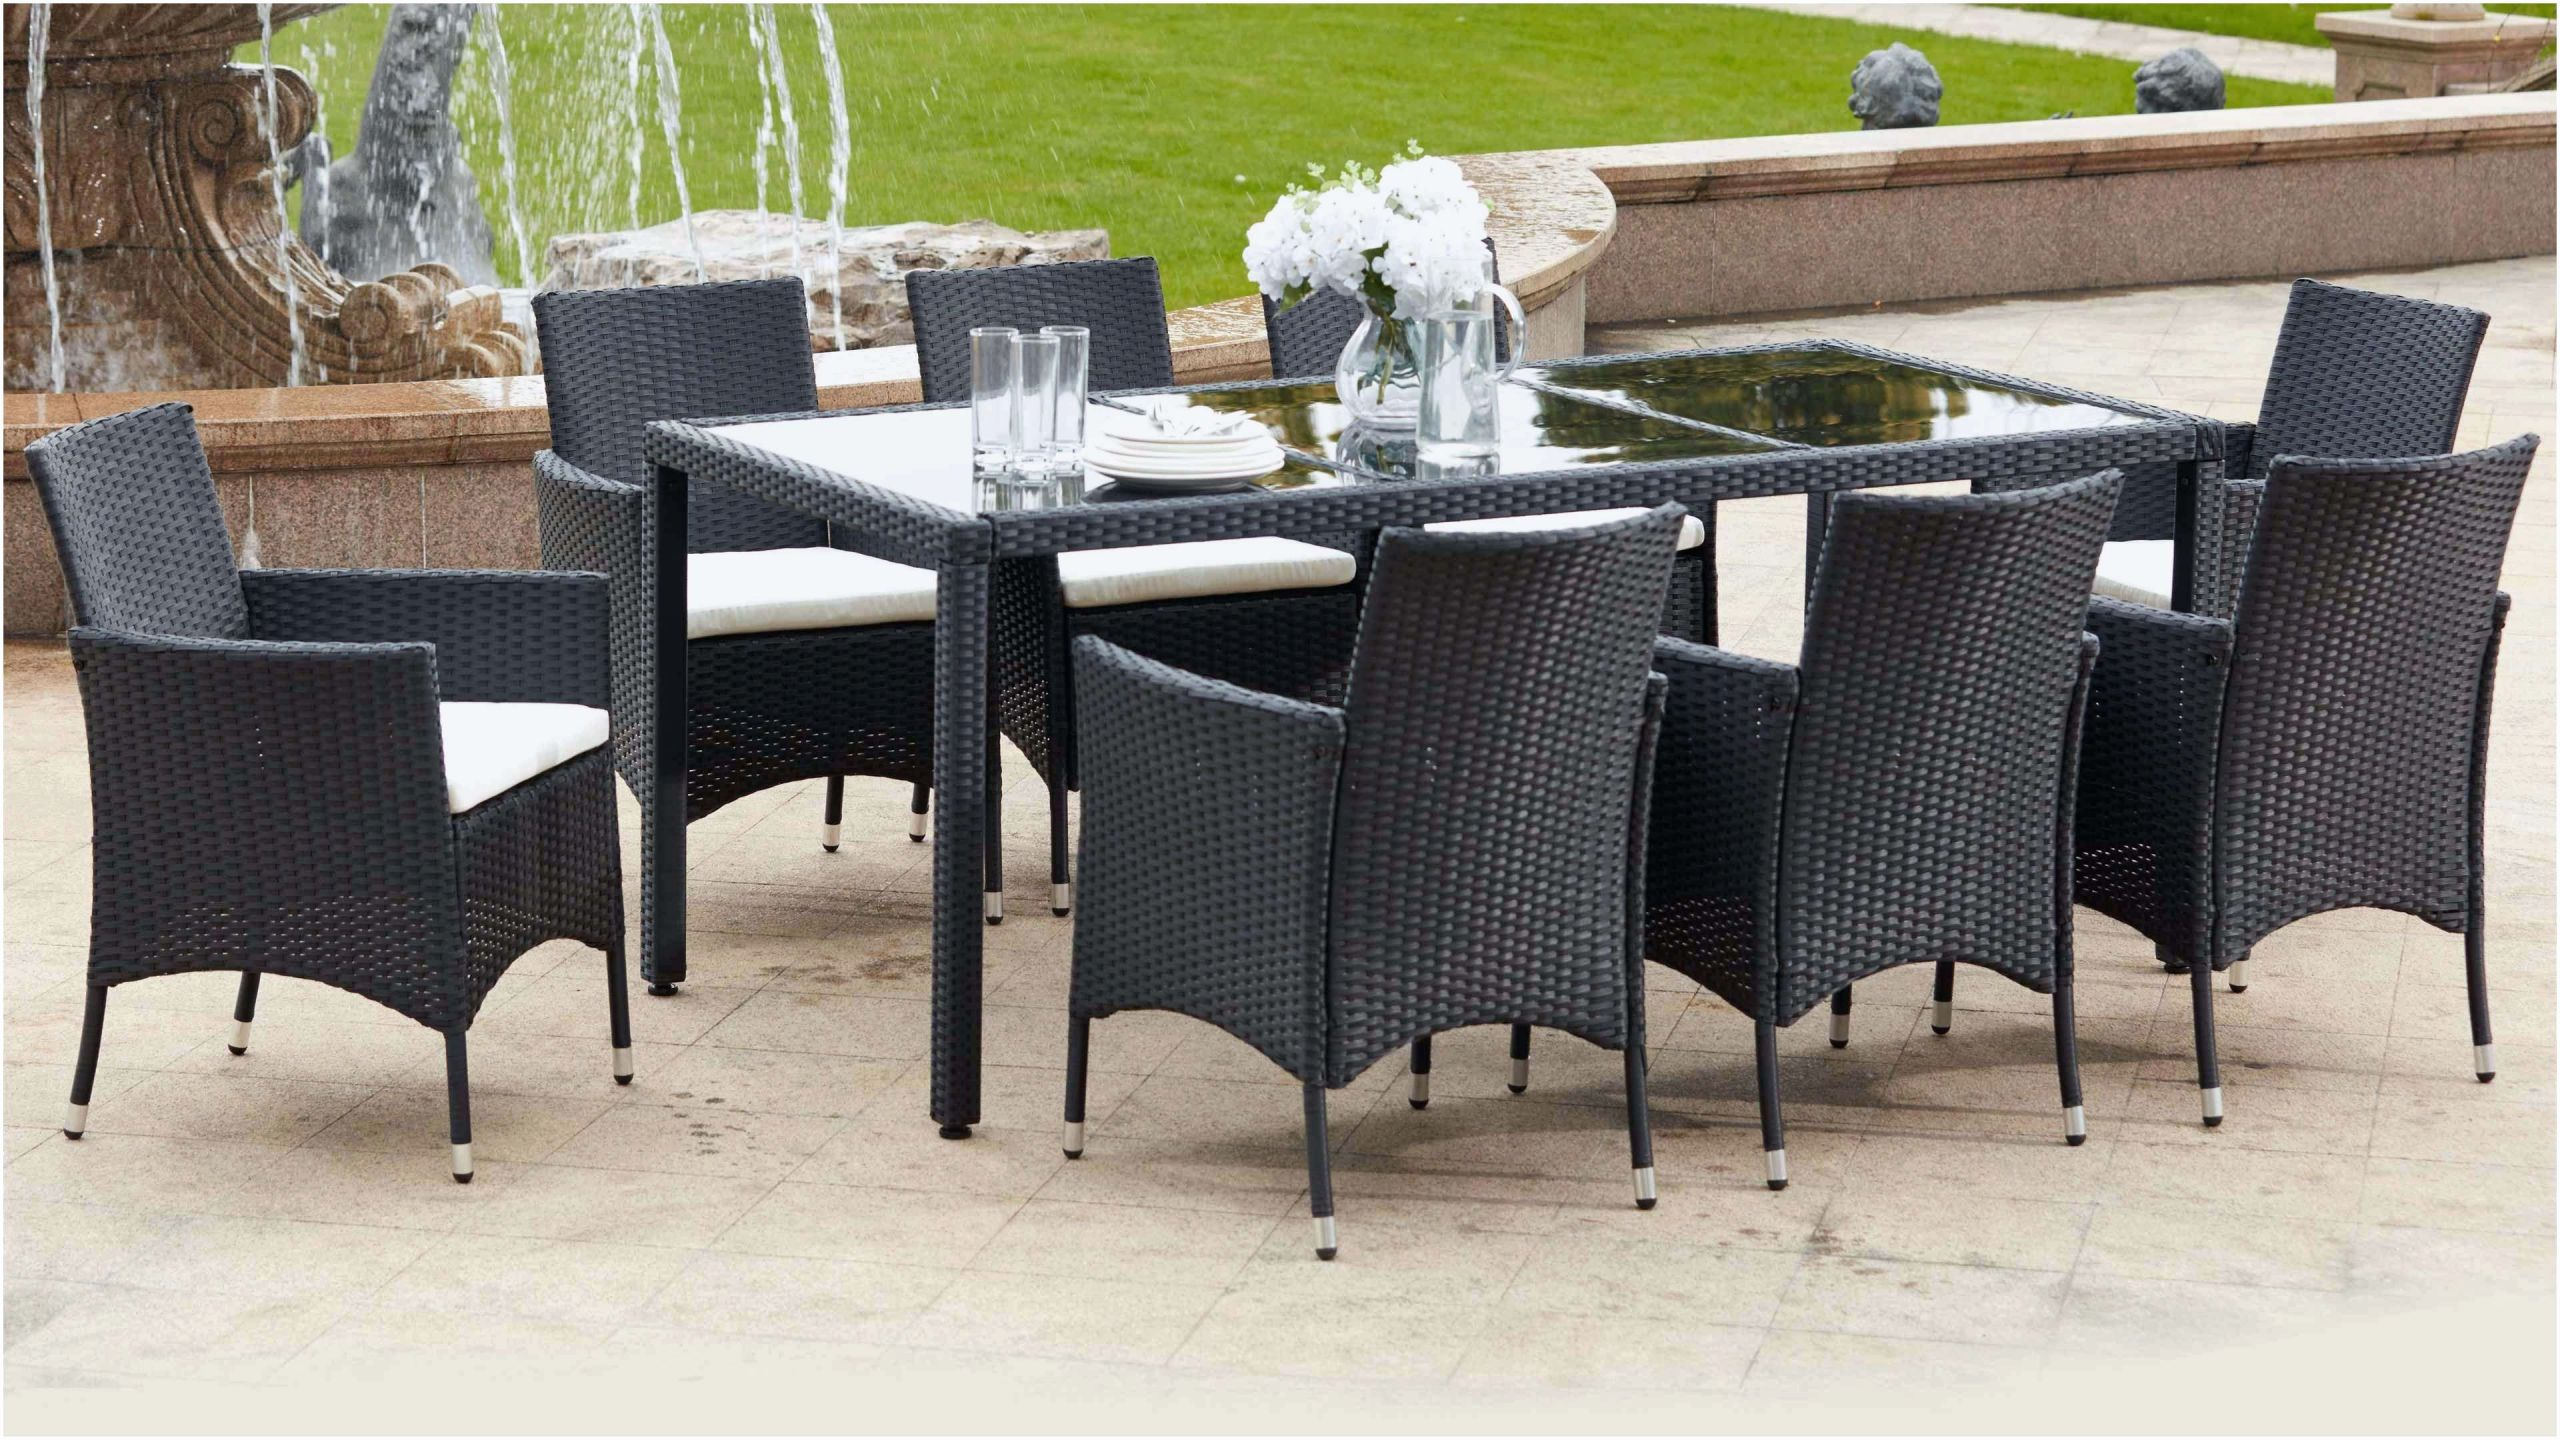 chaises de jardin i inspirant petite table i elegant 34 charmant table i jardin de chaises de jardin i scaled